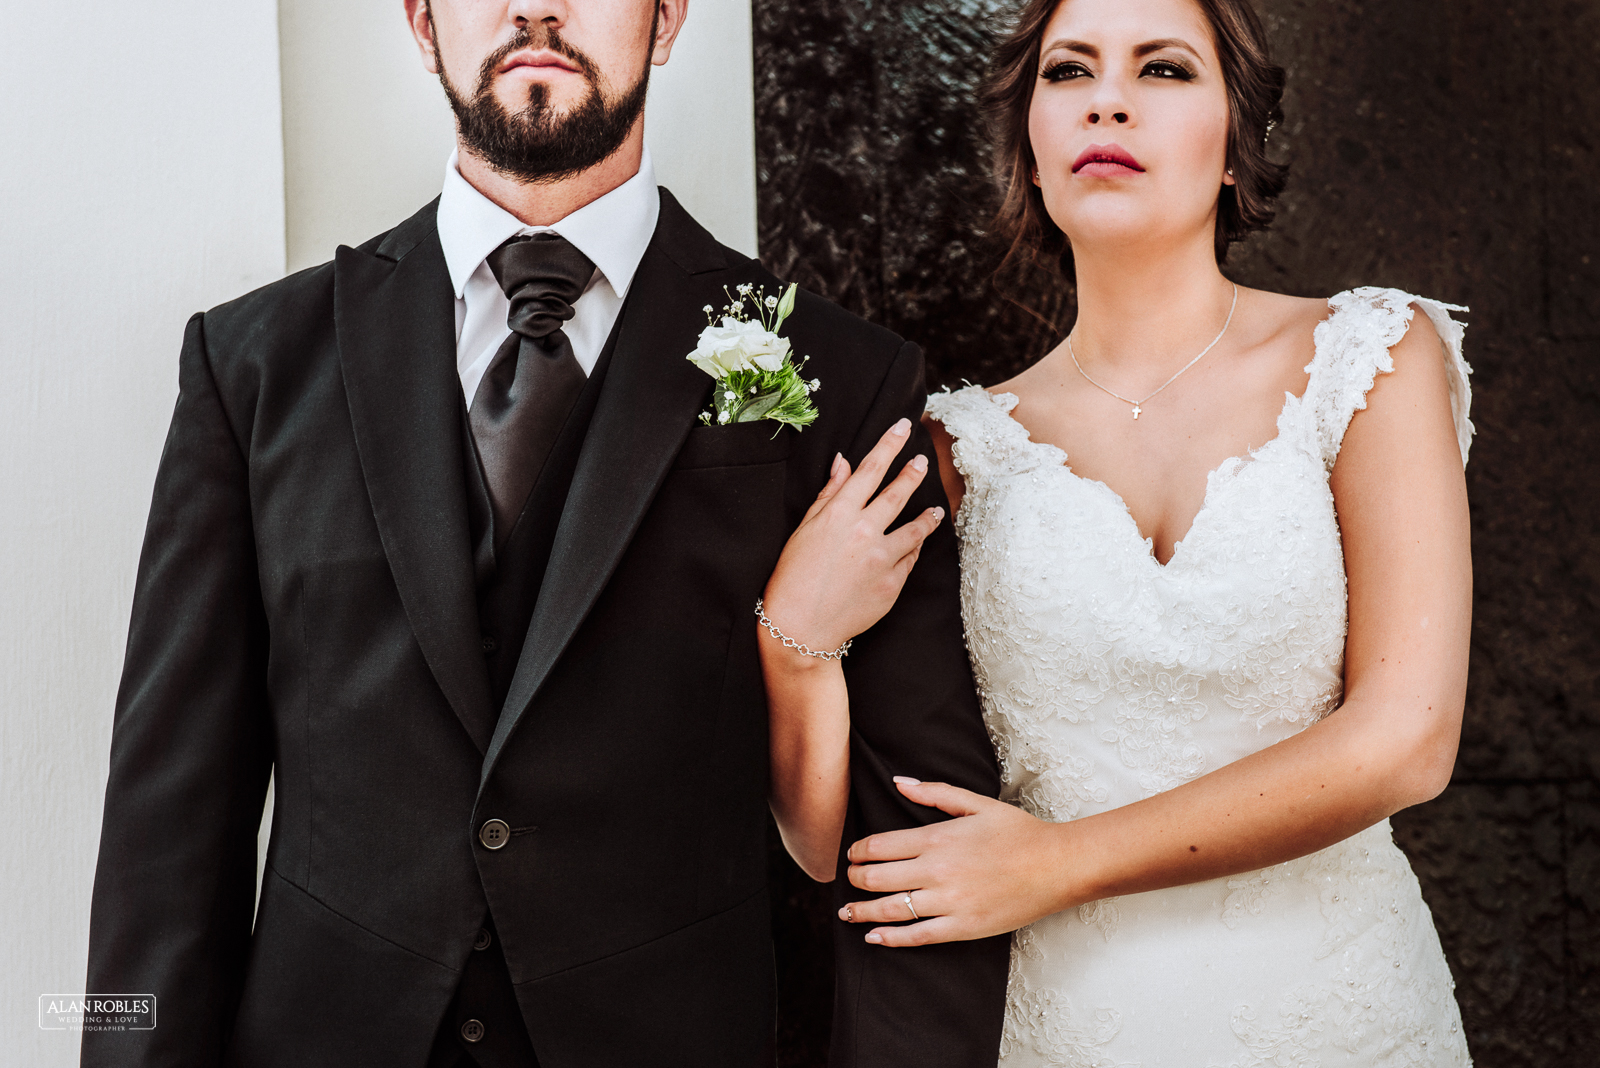 Fotografo de bodas Alan Robles-Boda en Guadalajara Real San Javier-38